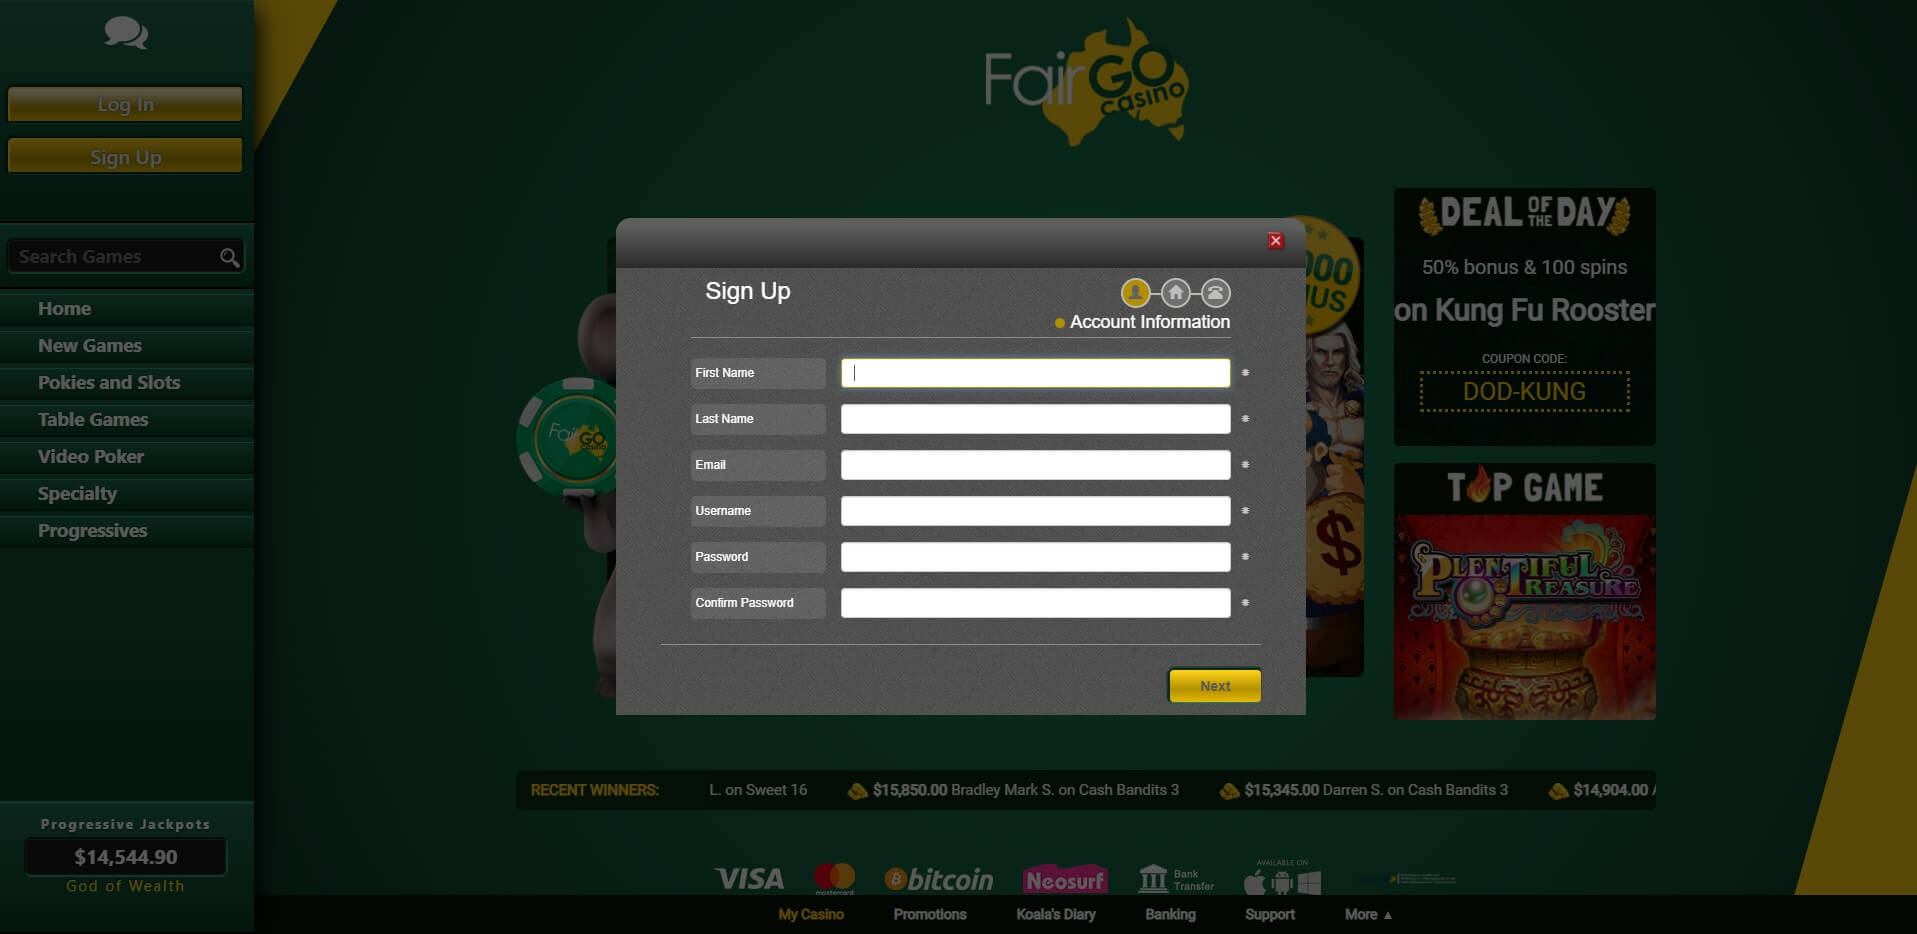 Fair Go Casino Sing Up Screenshot